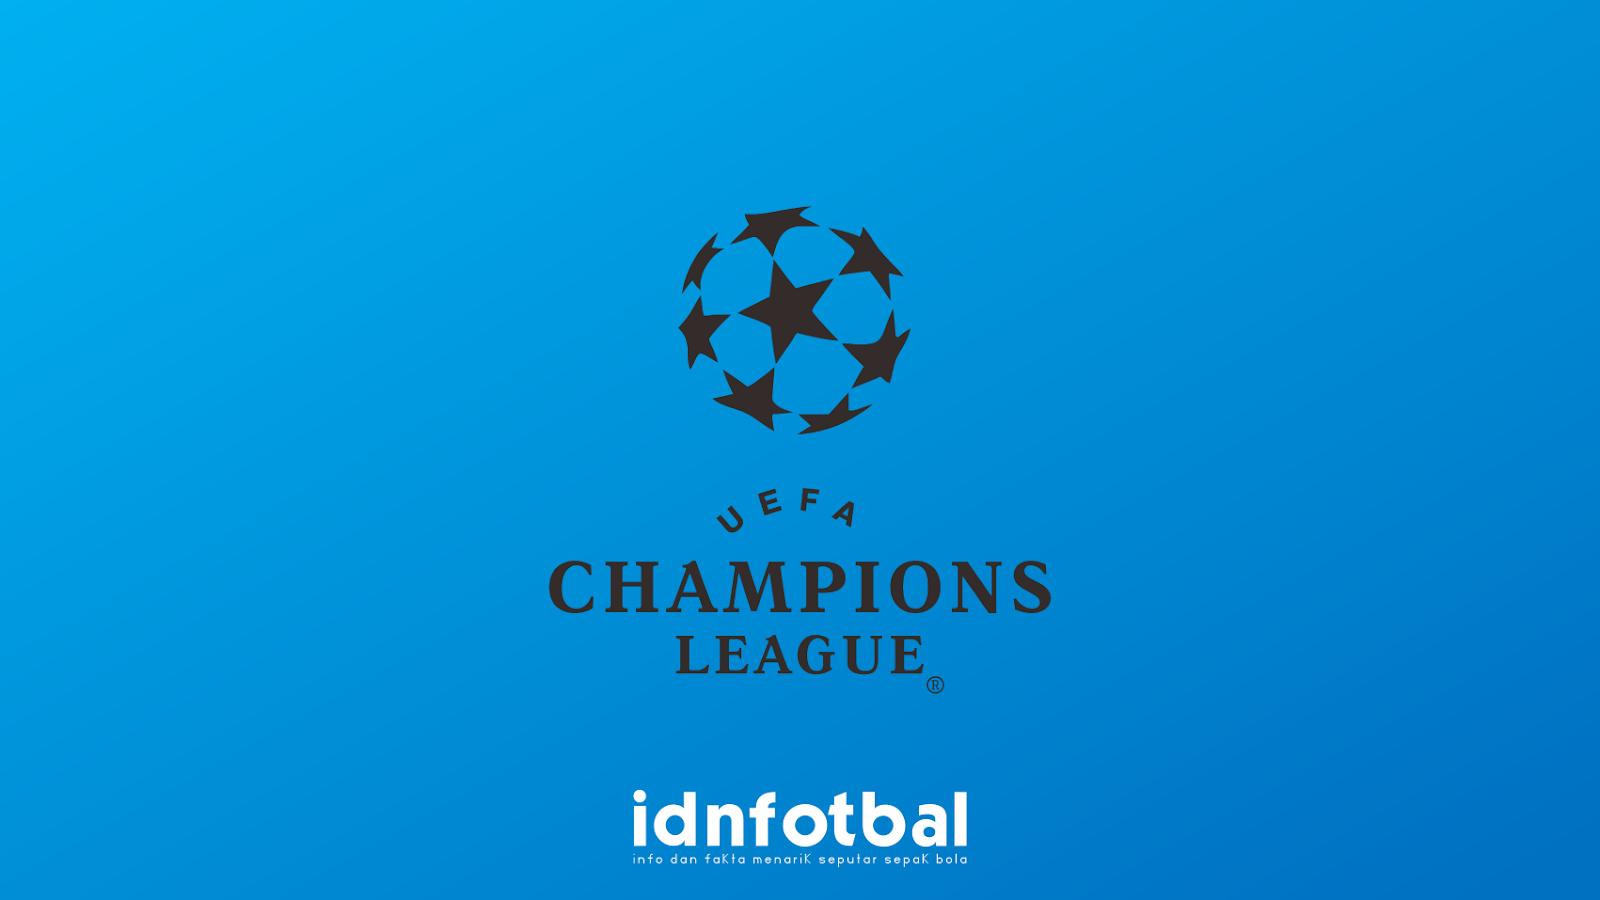 Idnfotbal - Liga Champions